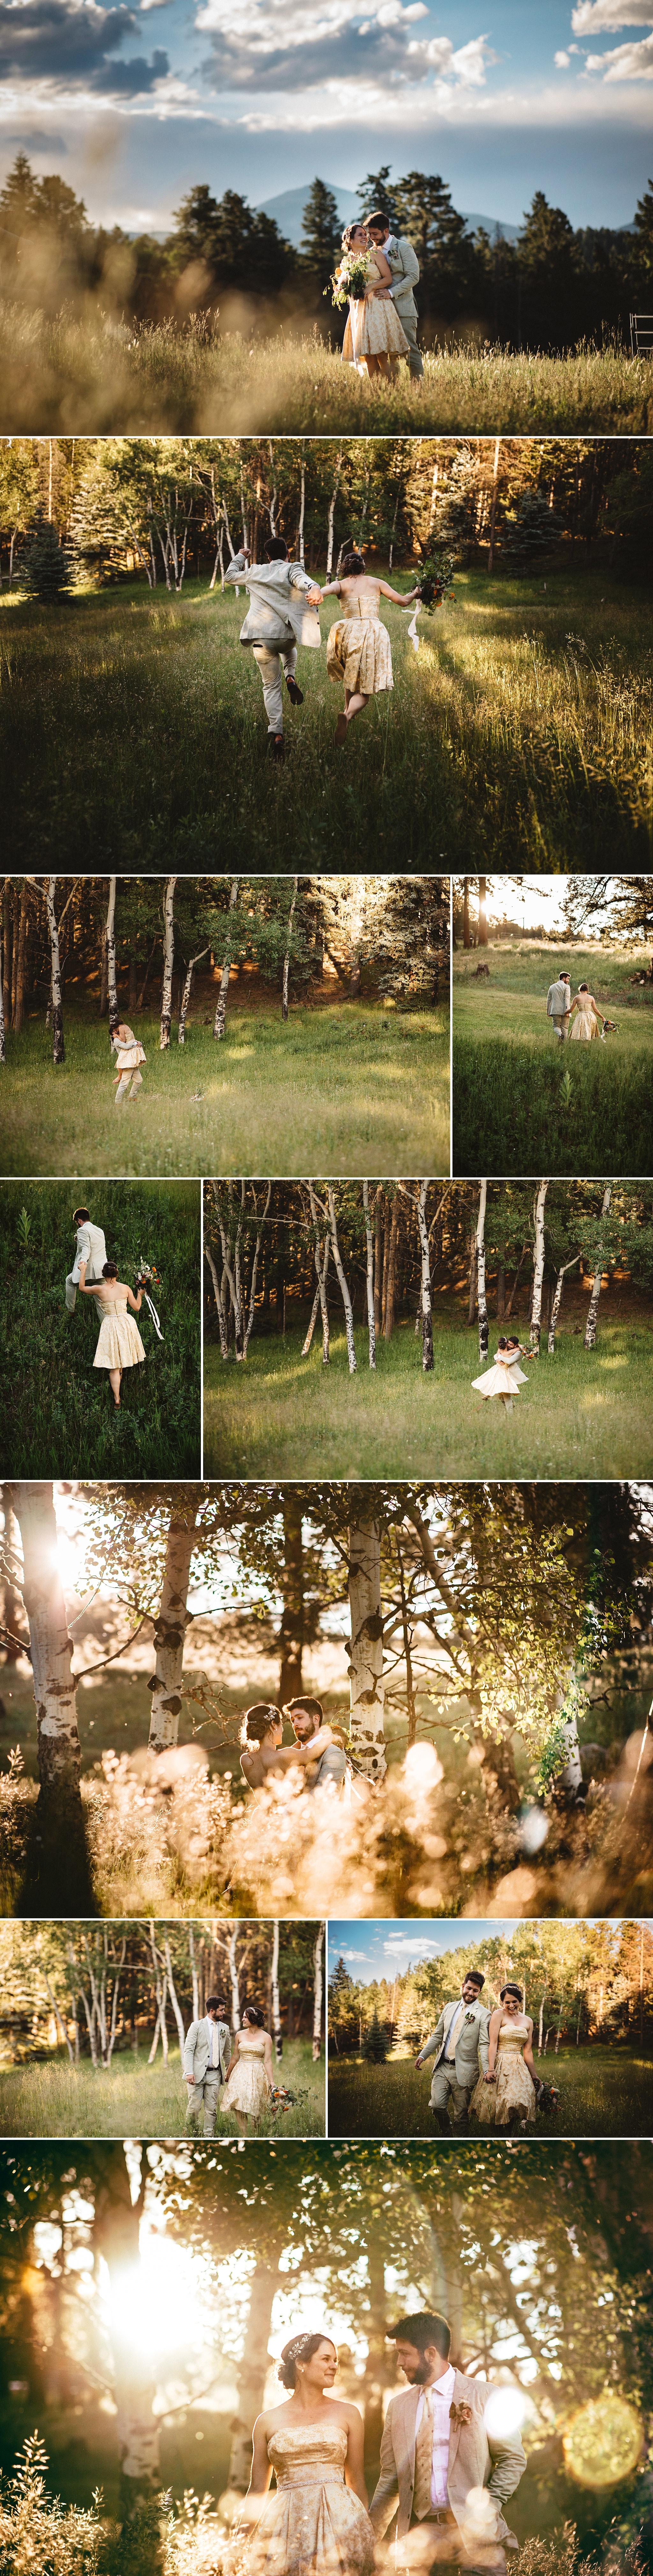 Ansley+Julian-Willow-Creek-Ranch-Evergreen-Wedding-052_WEB.jpg